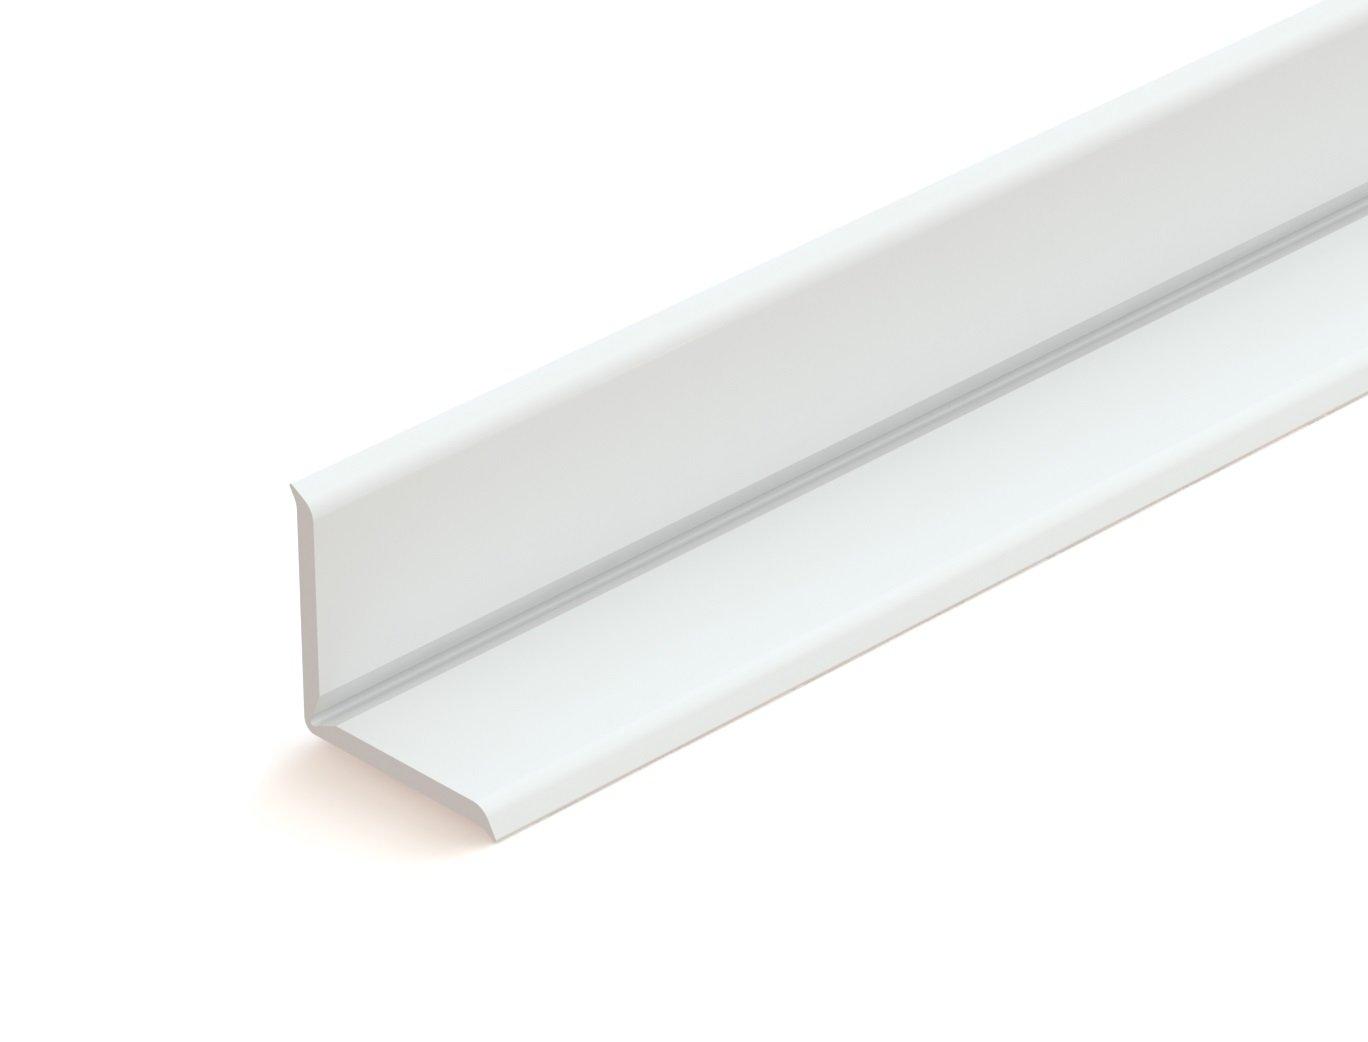 Flexible Bath Shower Adhesive Sealant 3 5m Seal 1 Roll